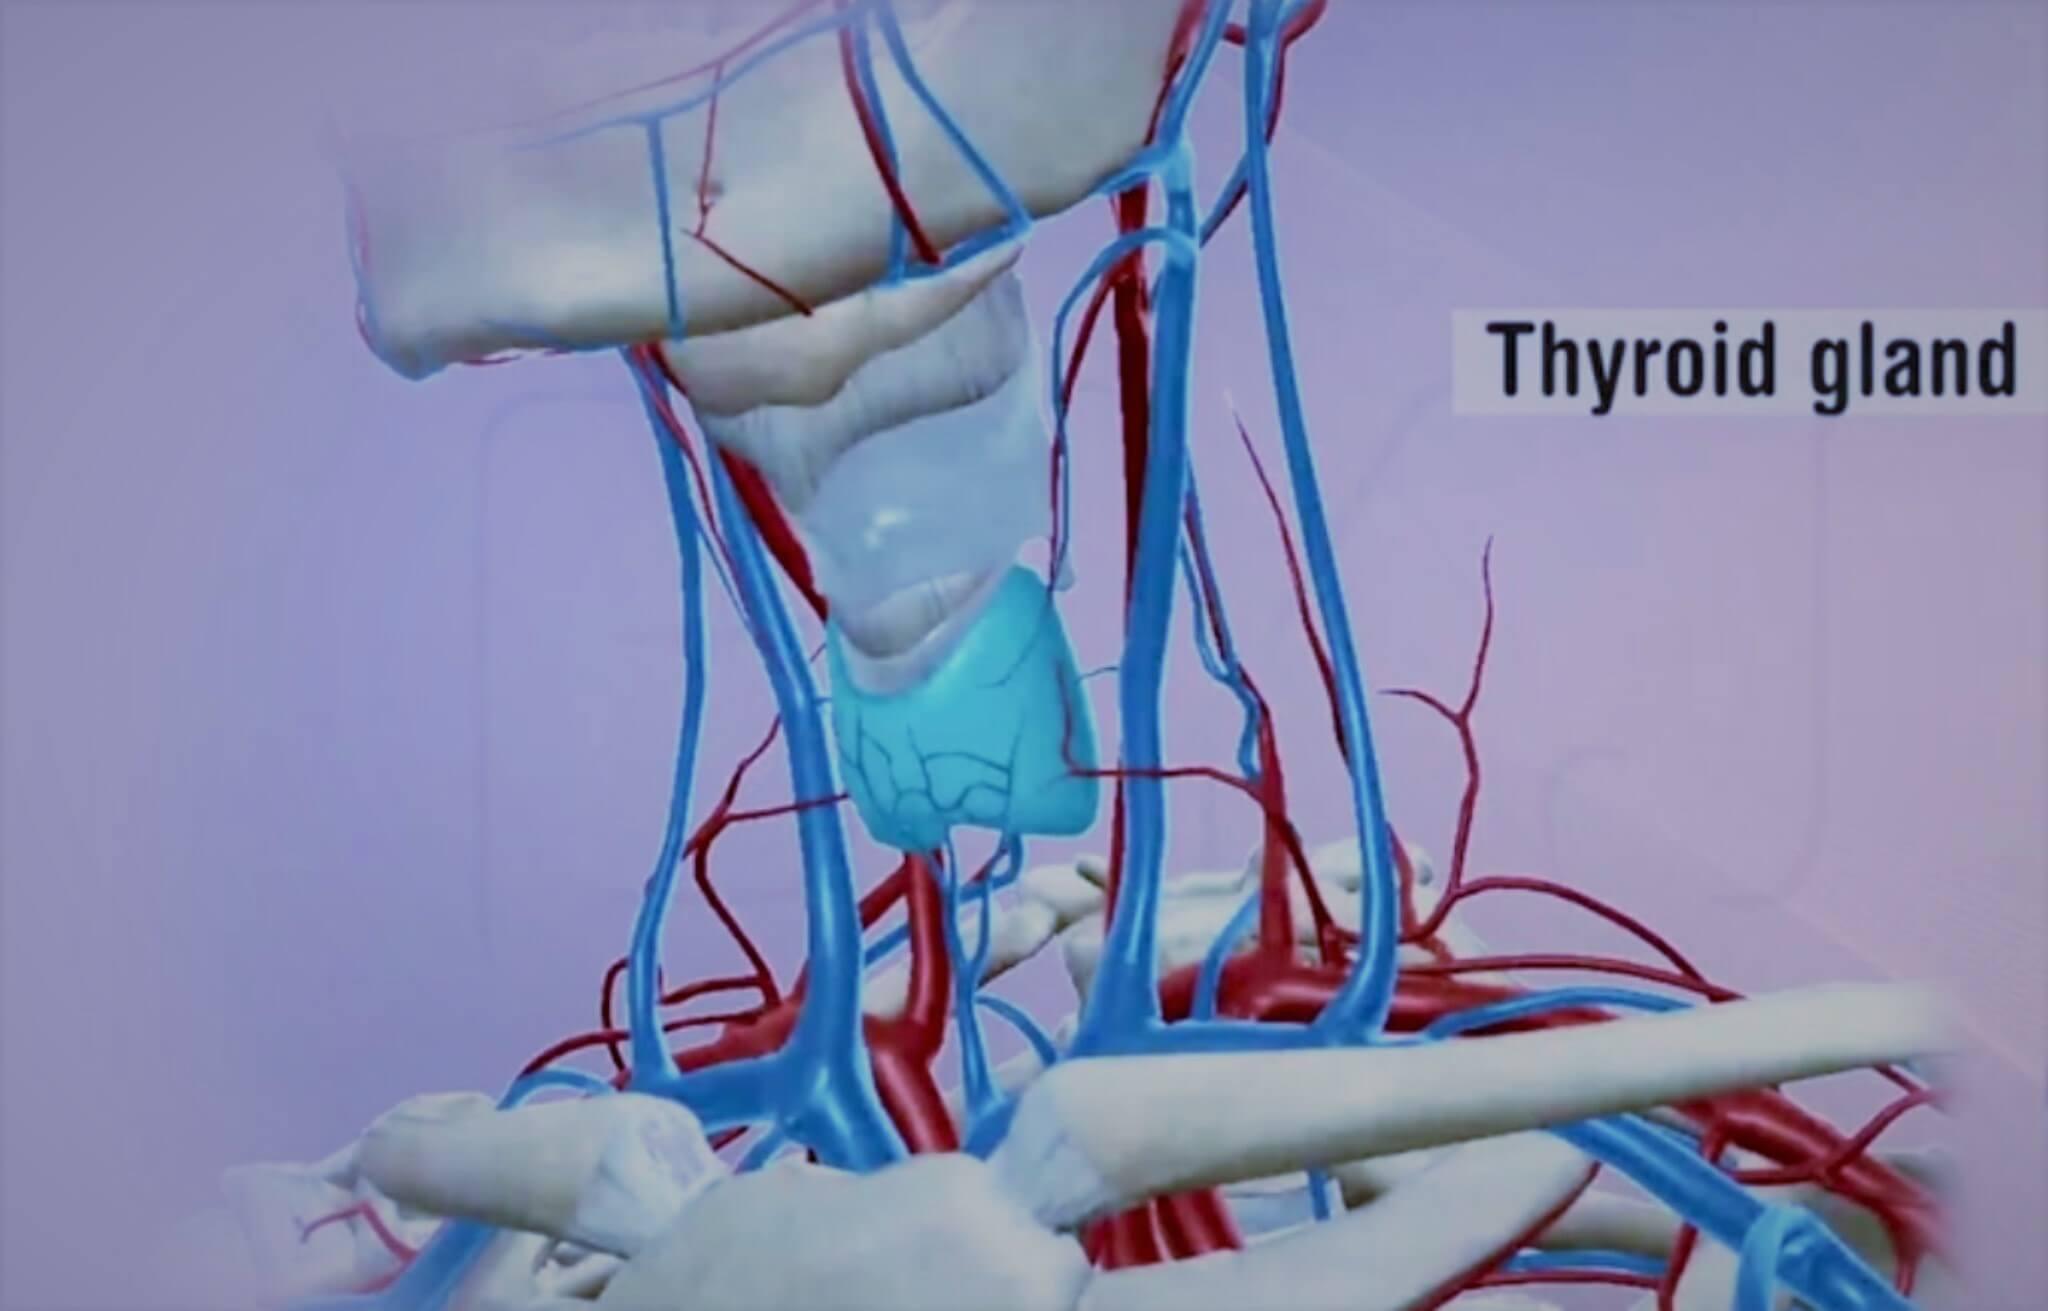 Asse ipotalamo ipofisi tiroide - Le guide Corebo